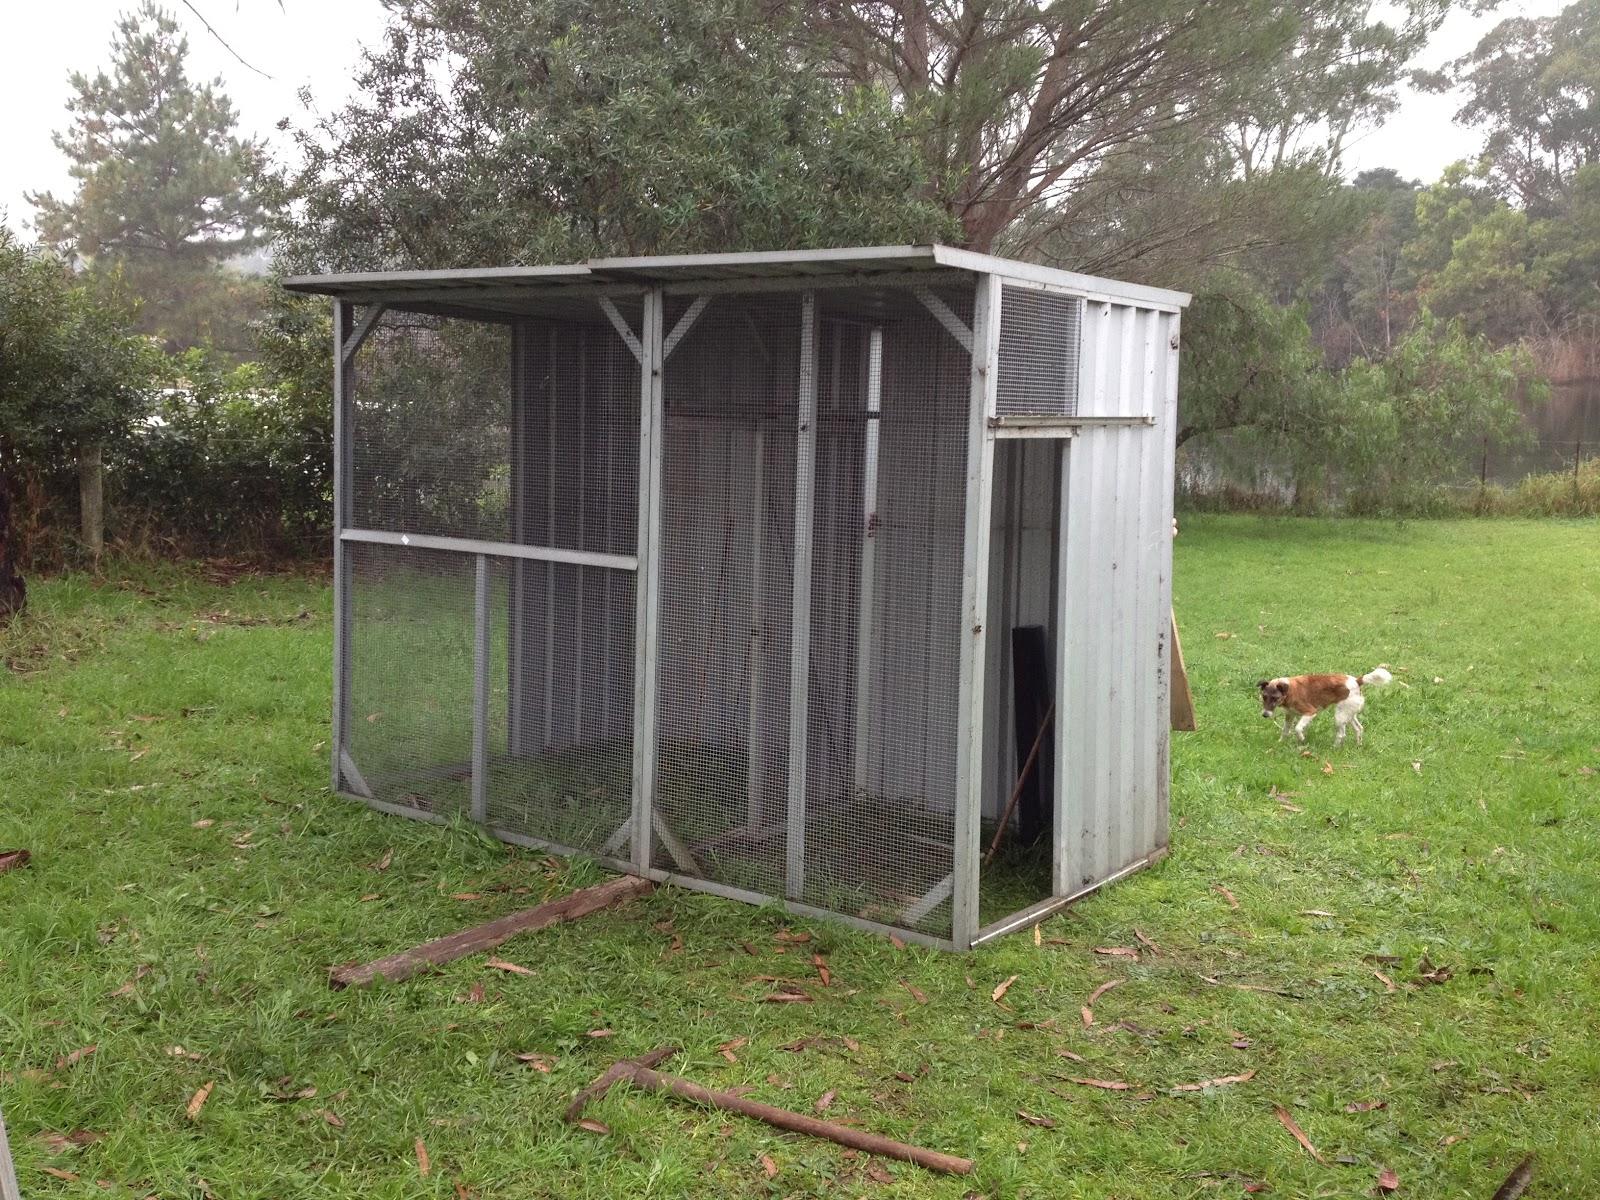 Aussie Bengos: Moving Forward with Breeding